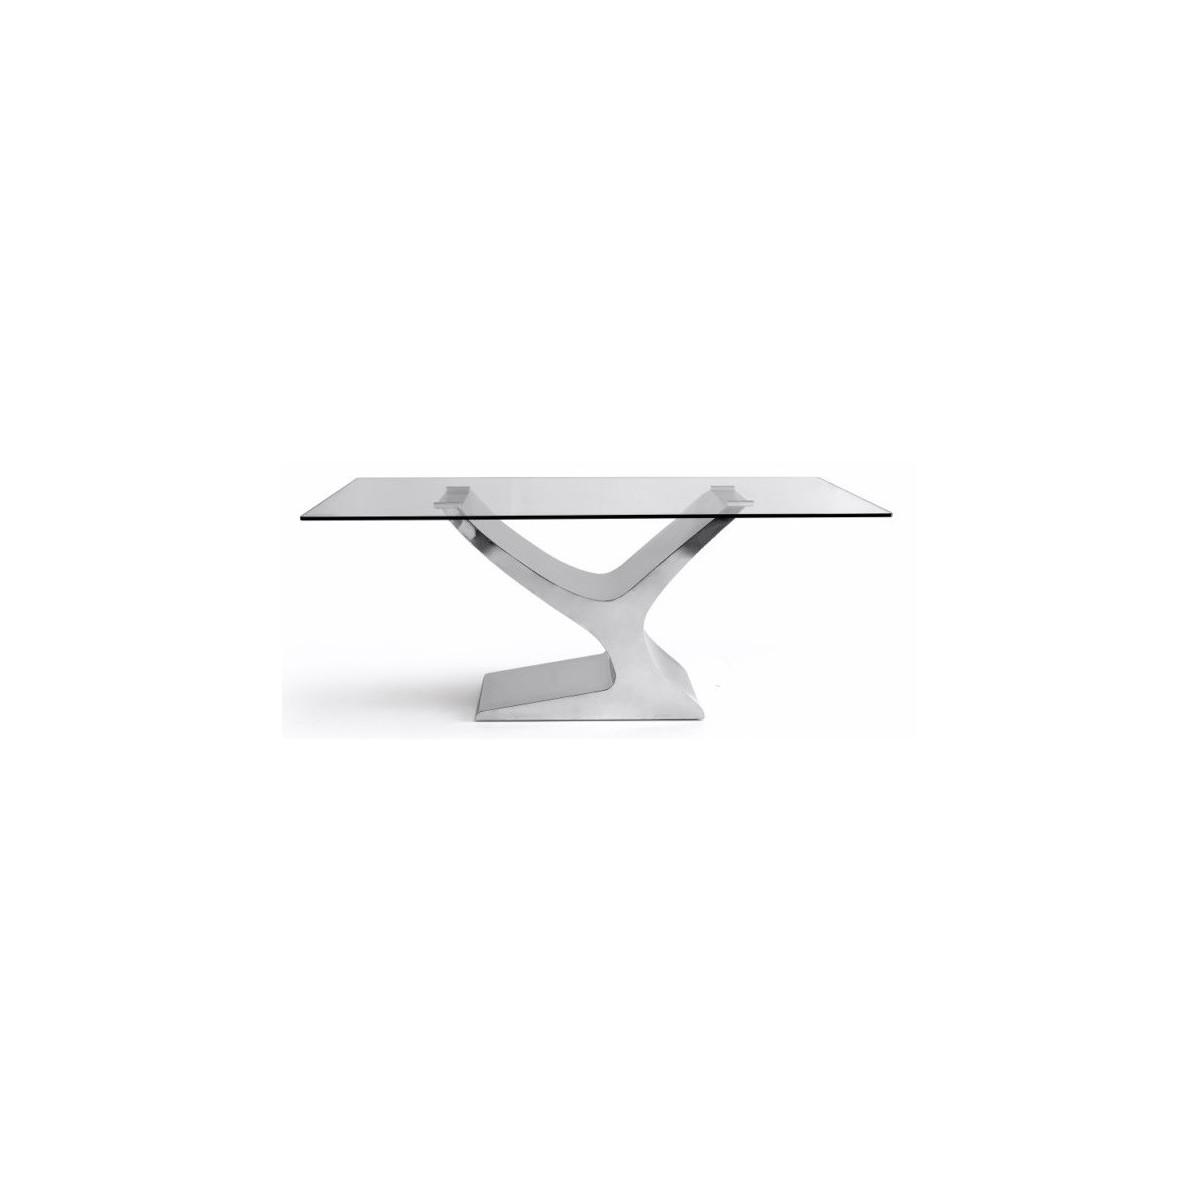 Medidas mesas comedor affordable clsico renovado comedor - Medidas mesas comedor ...